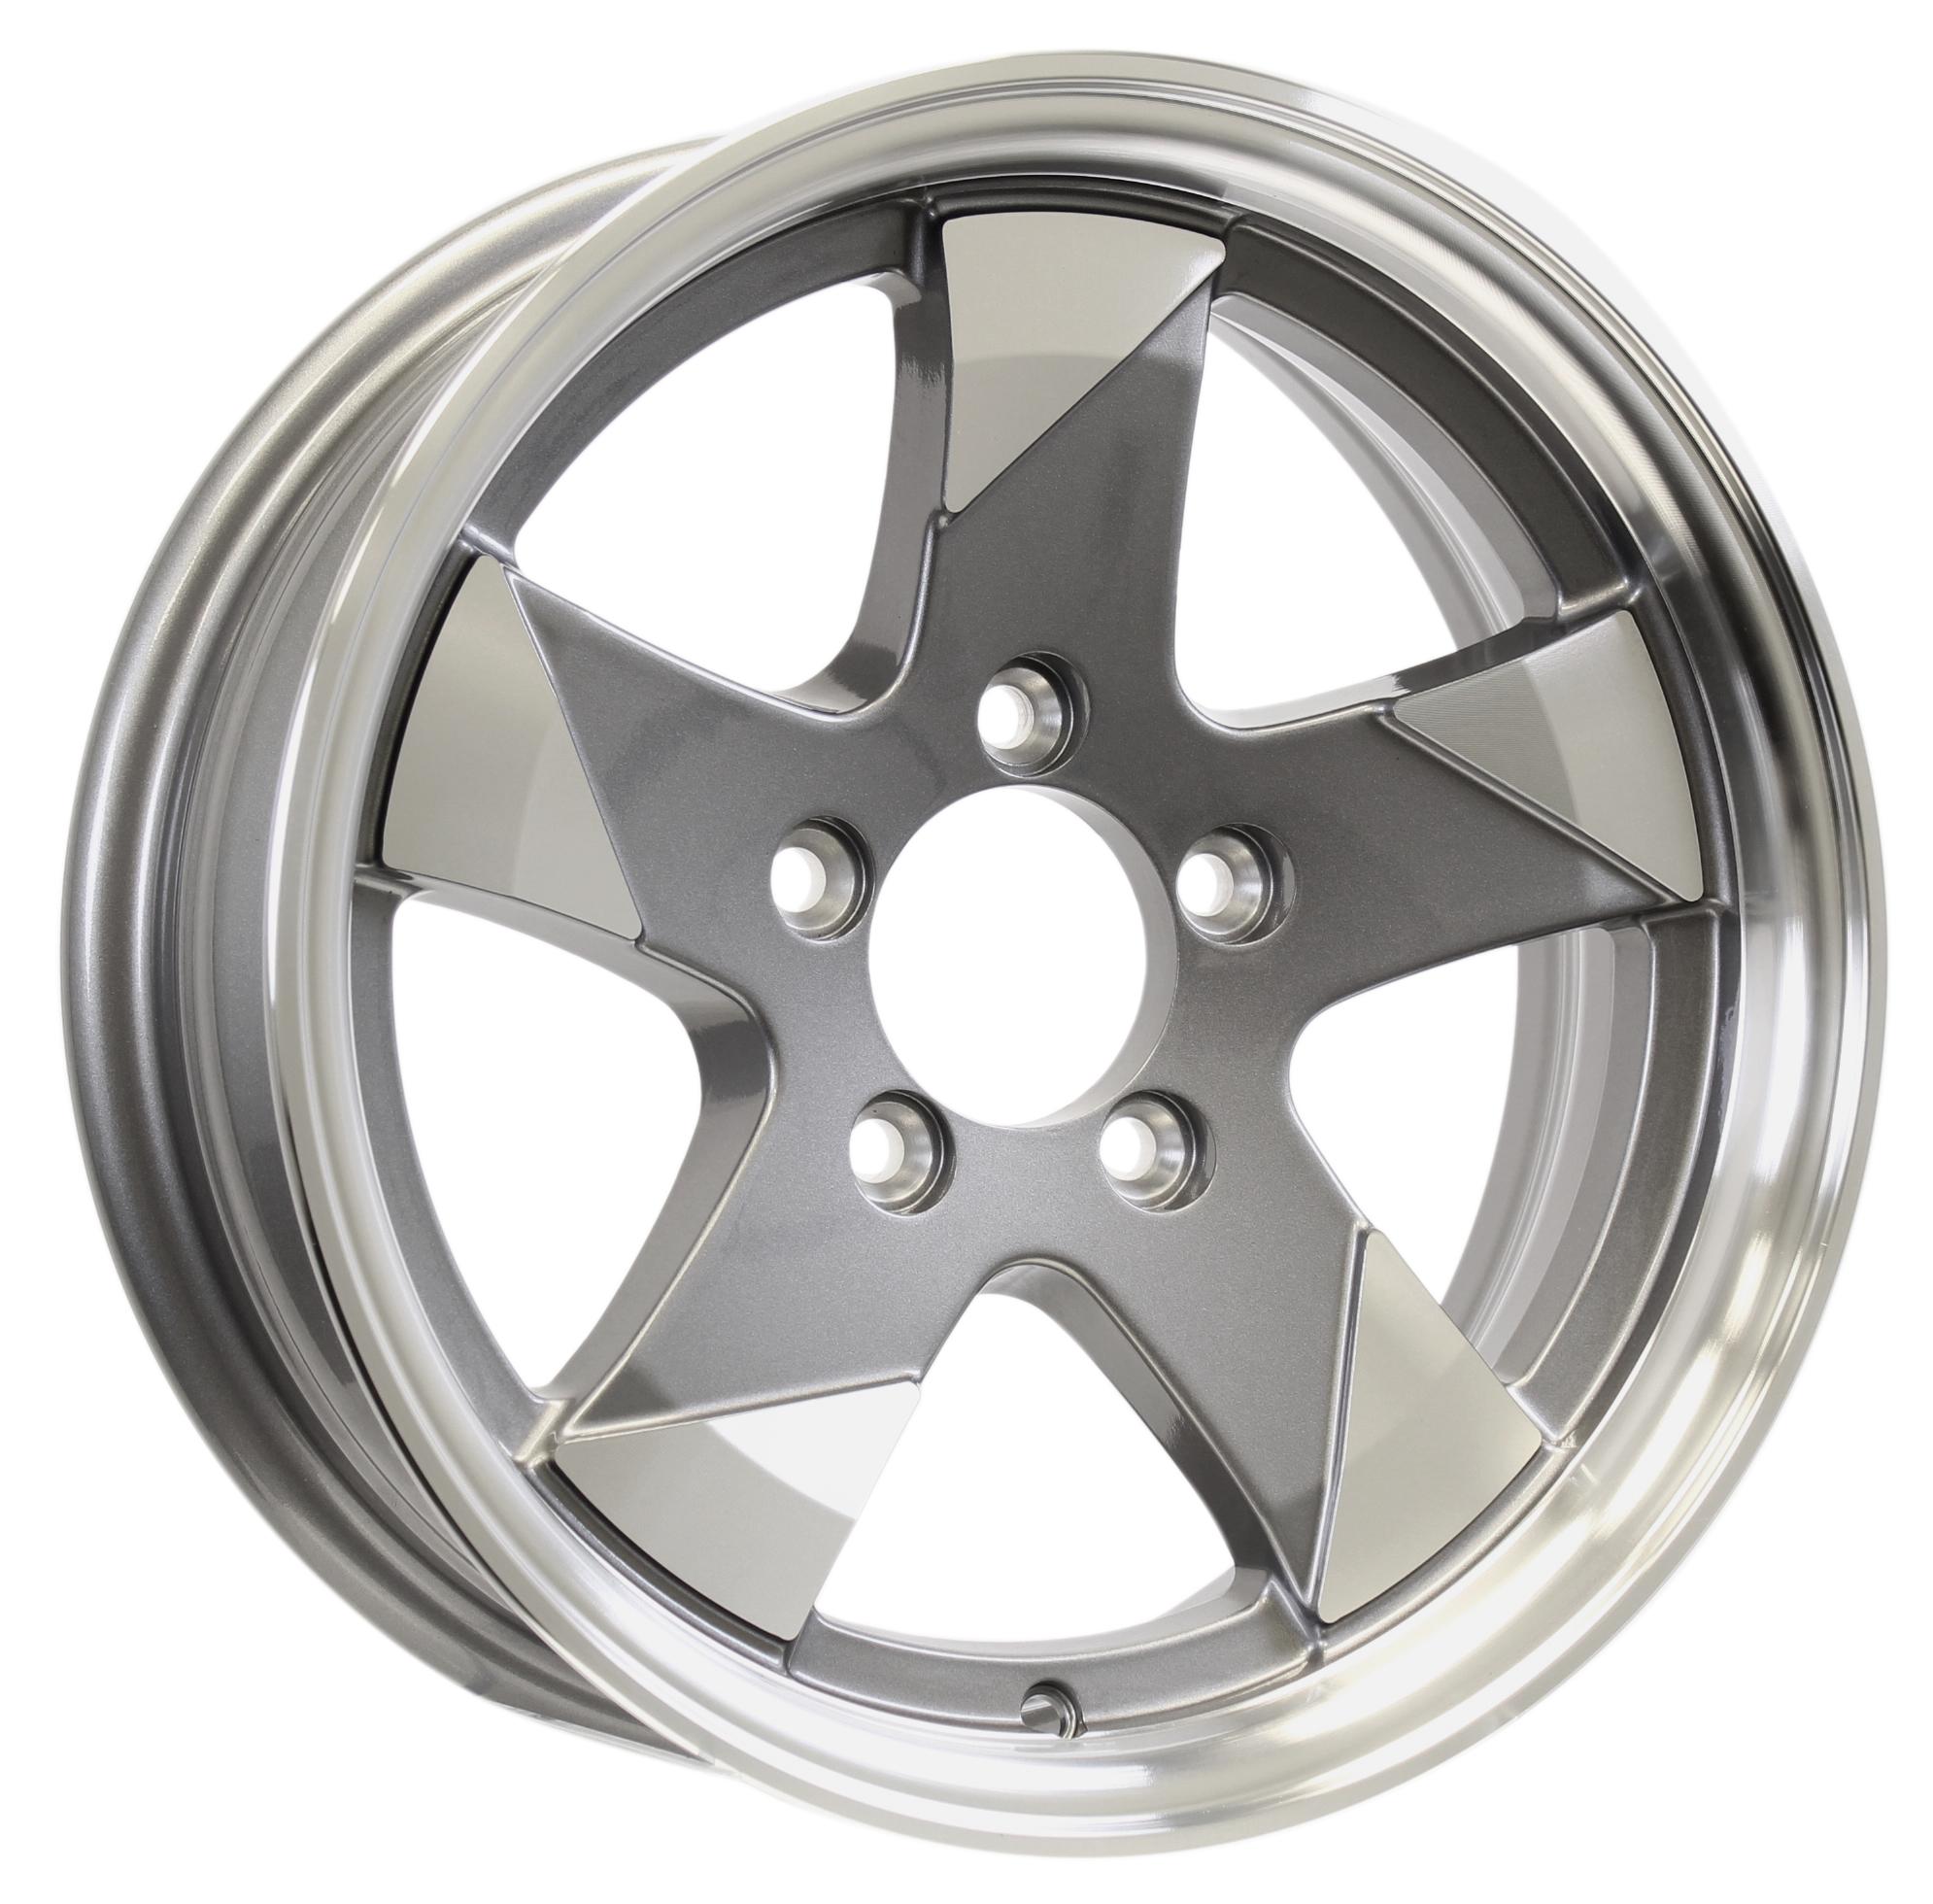 Ascent- 14x5.5 5-4.5 Gun Metal Aluminum Wheel Image